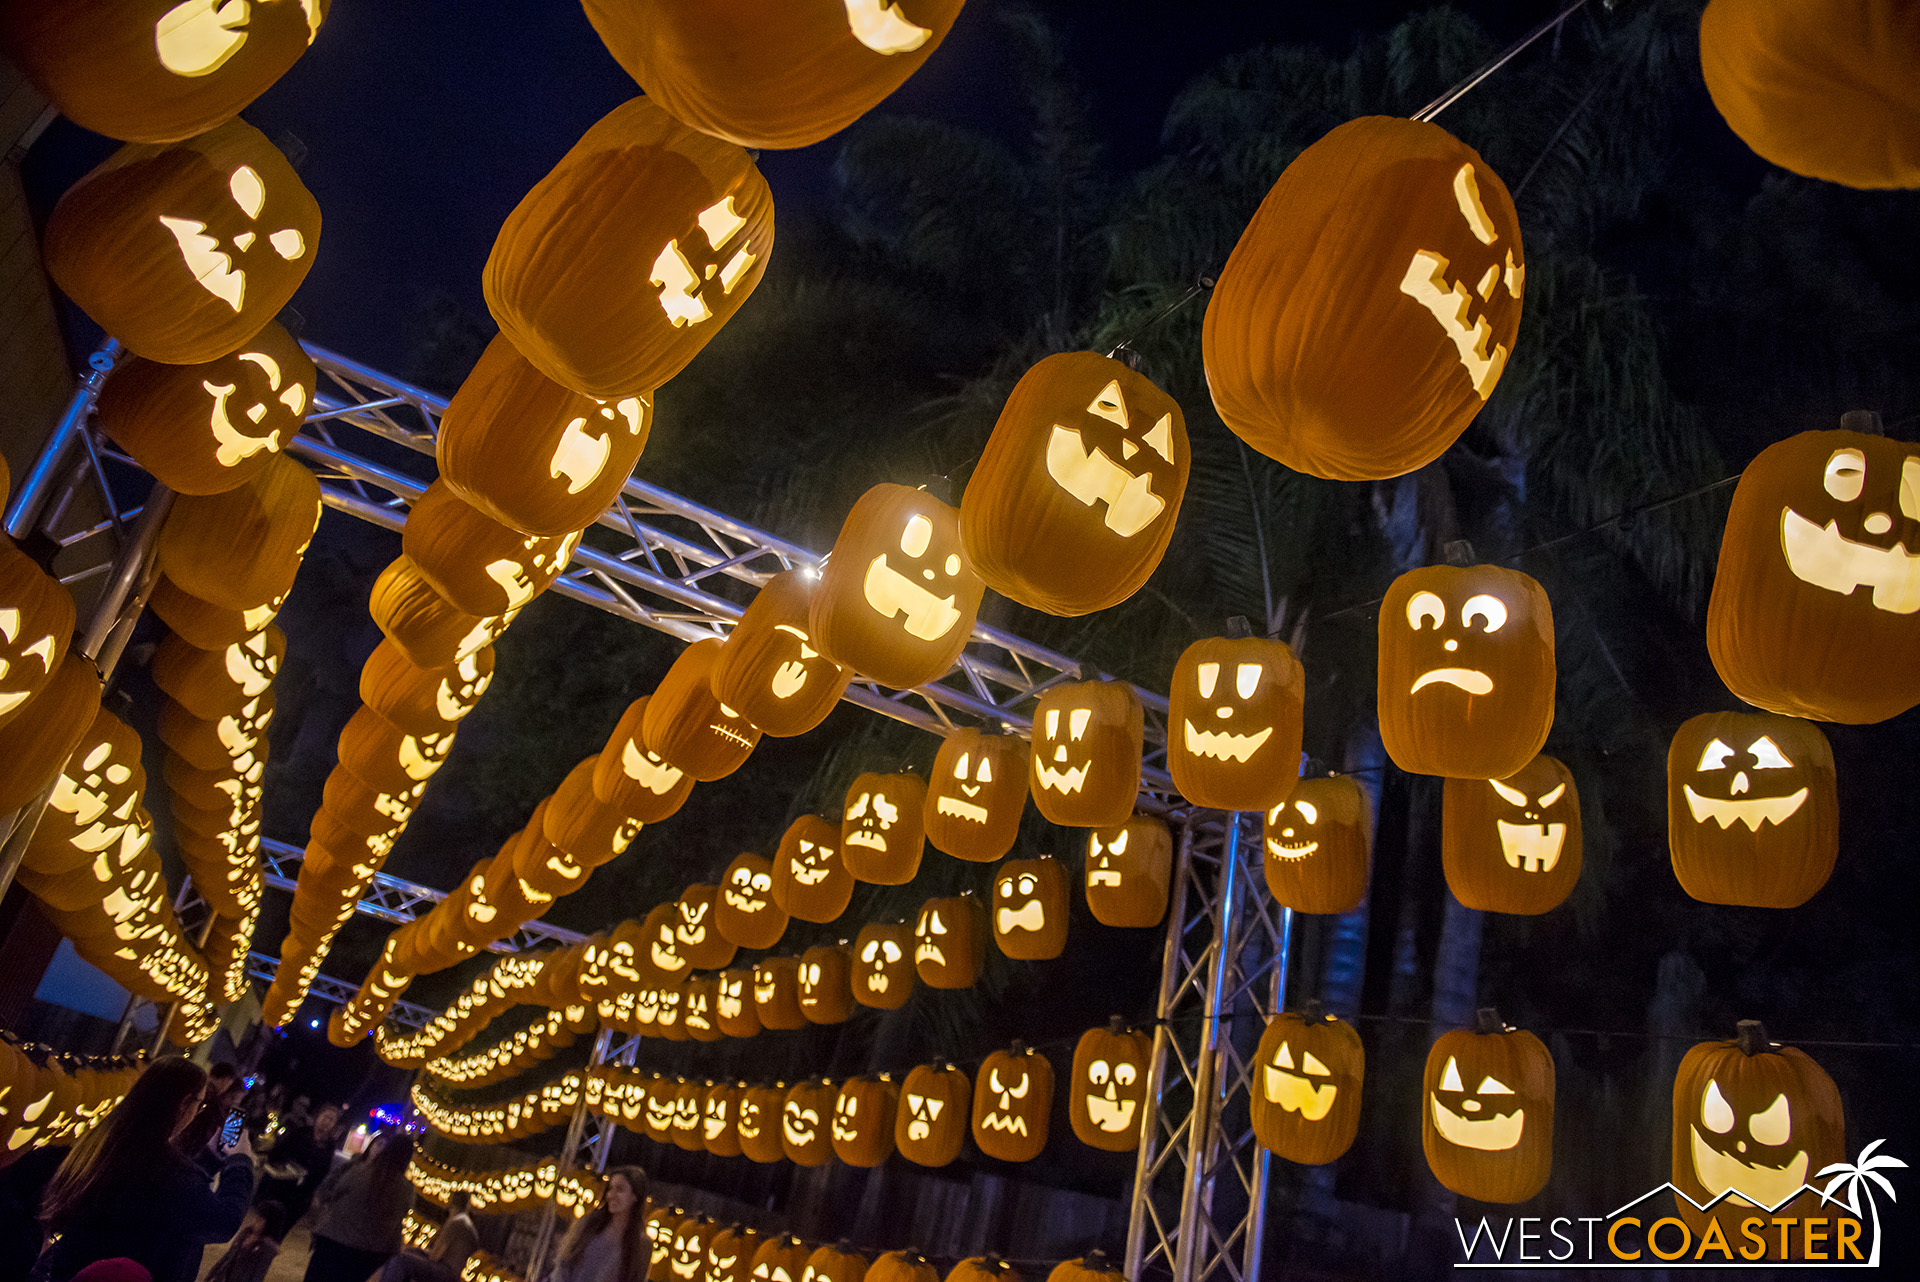 A pumpkin tunnel kicks off the Pumpkin Walk main attraction of Pumpkin Nights.